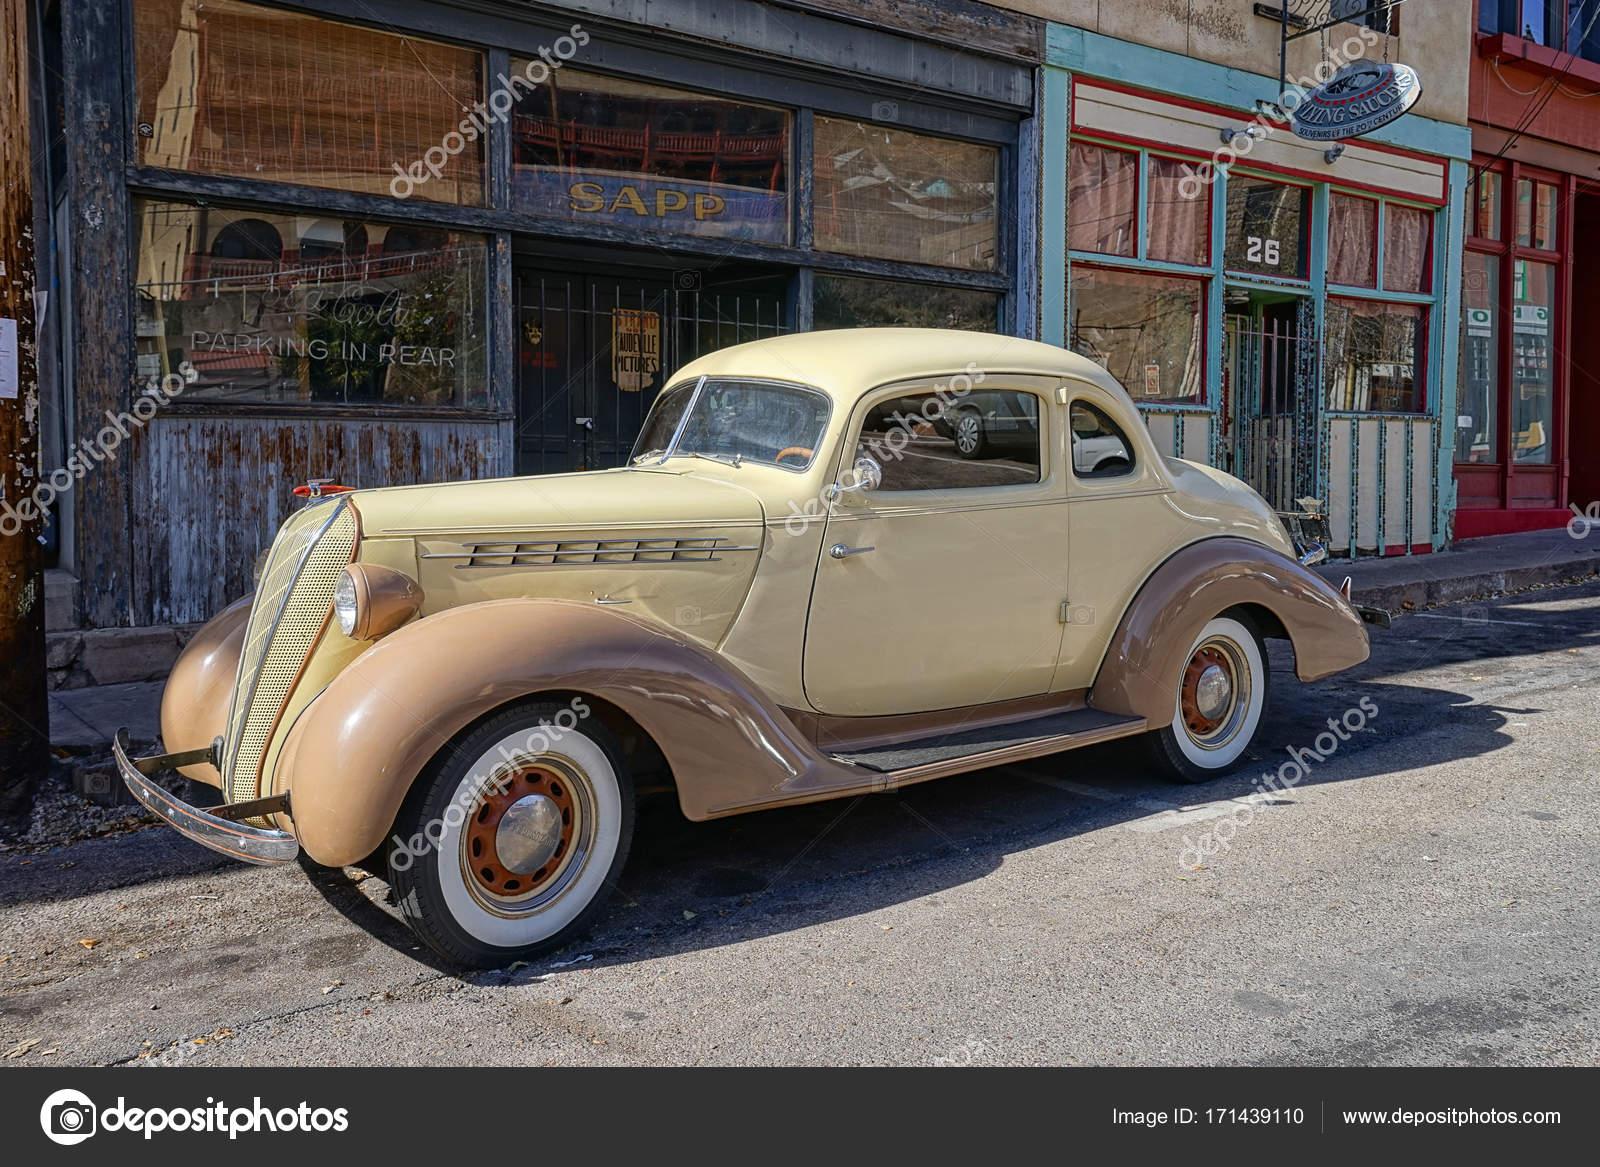 Vintage Car In Bisbee Arizona Stock Editorial Photo Quasarphoto - Bisbee car show